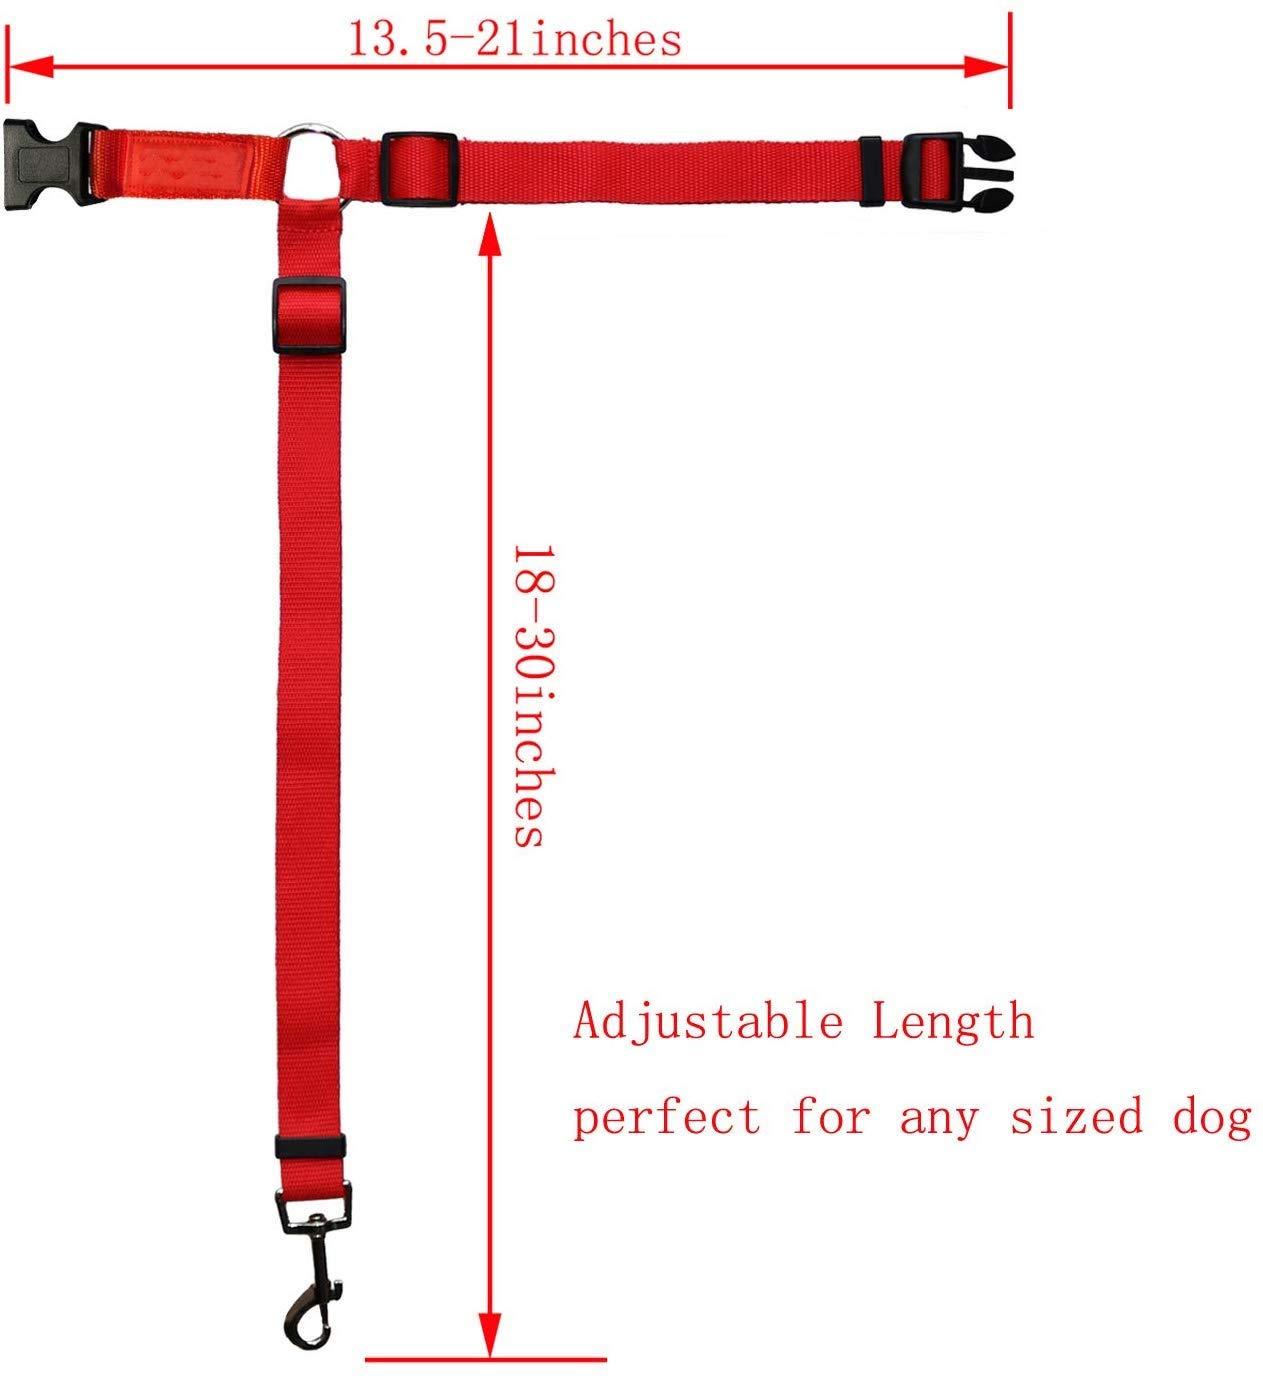 Dog Cat Safety Seat Belt Strap 2 Pack Doggy Car Headrest Restraint Easy Vehicle Travel with Pet Black Durable Zipline /& Tether Backseat for Traveling Adjustable Nylon Fabric Harness for Dog